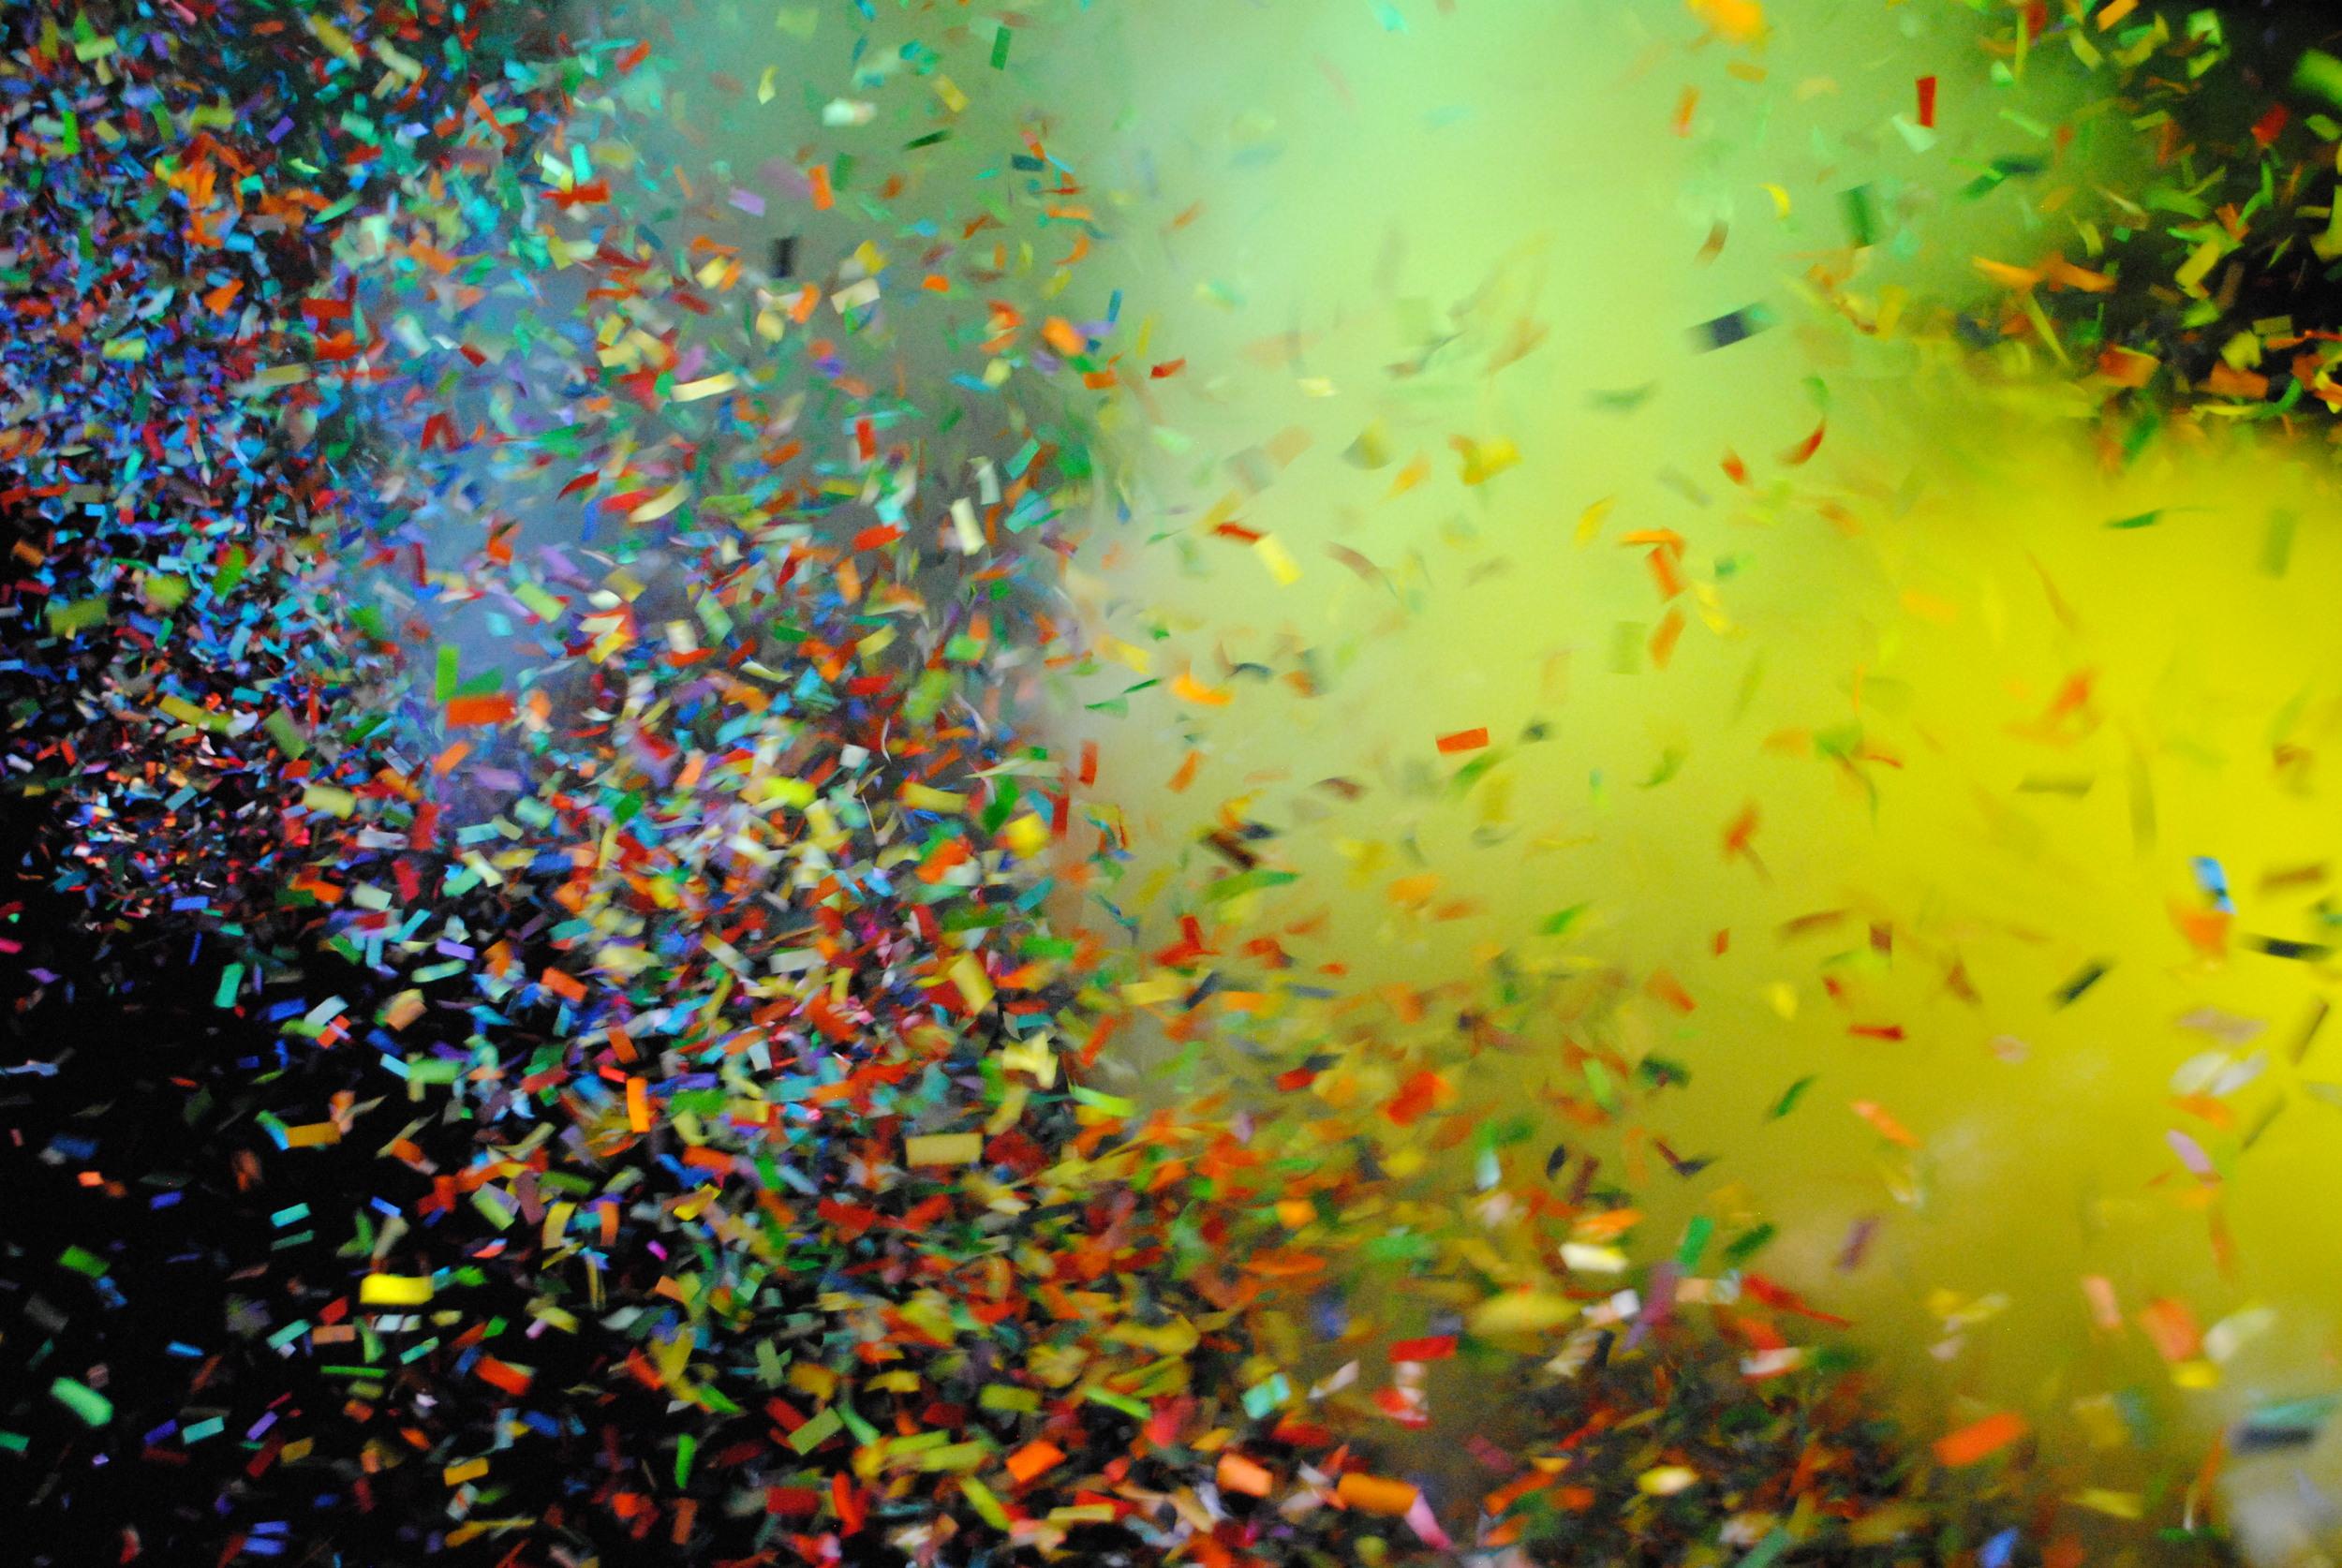 Confetti blast at Tame Impala, photograph by Liam McCarty (Bonnaroo 2016)